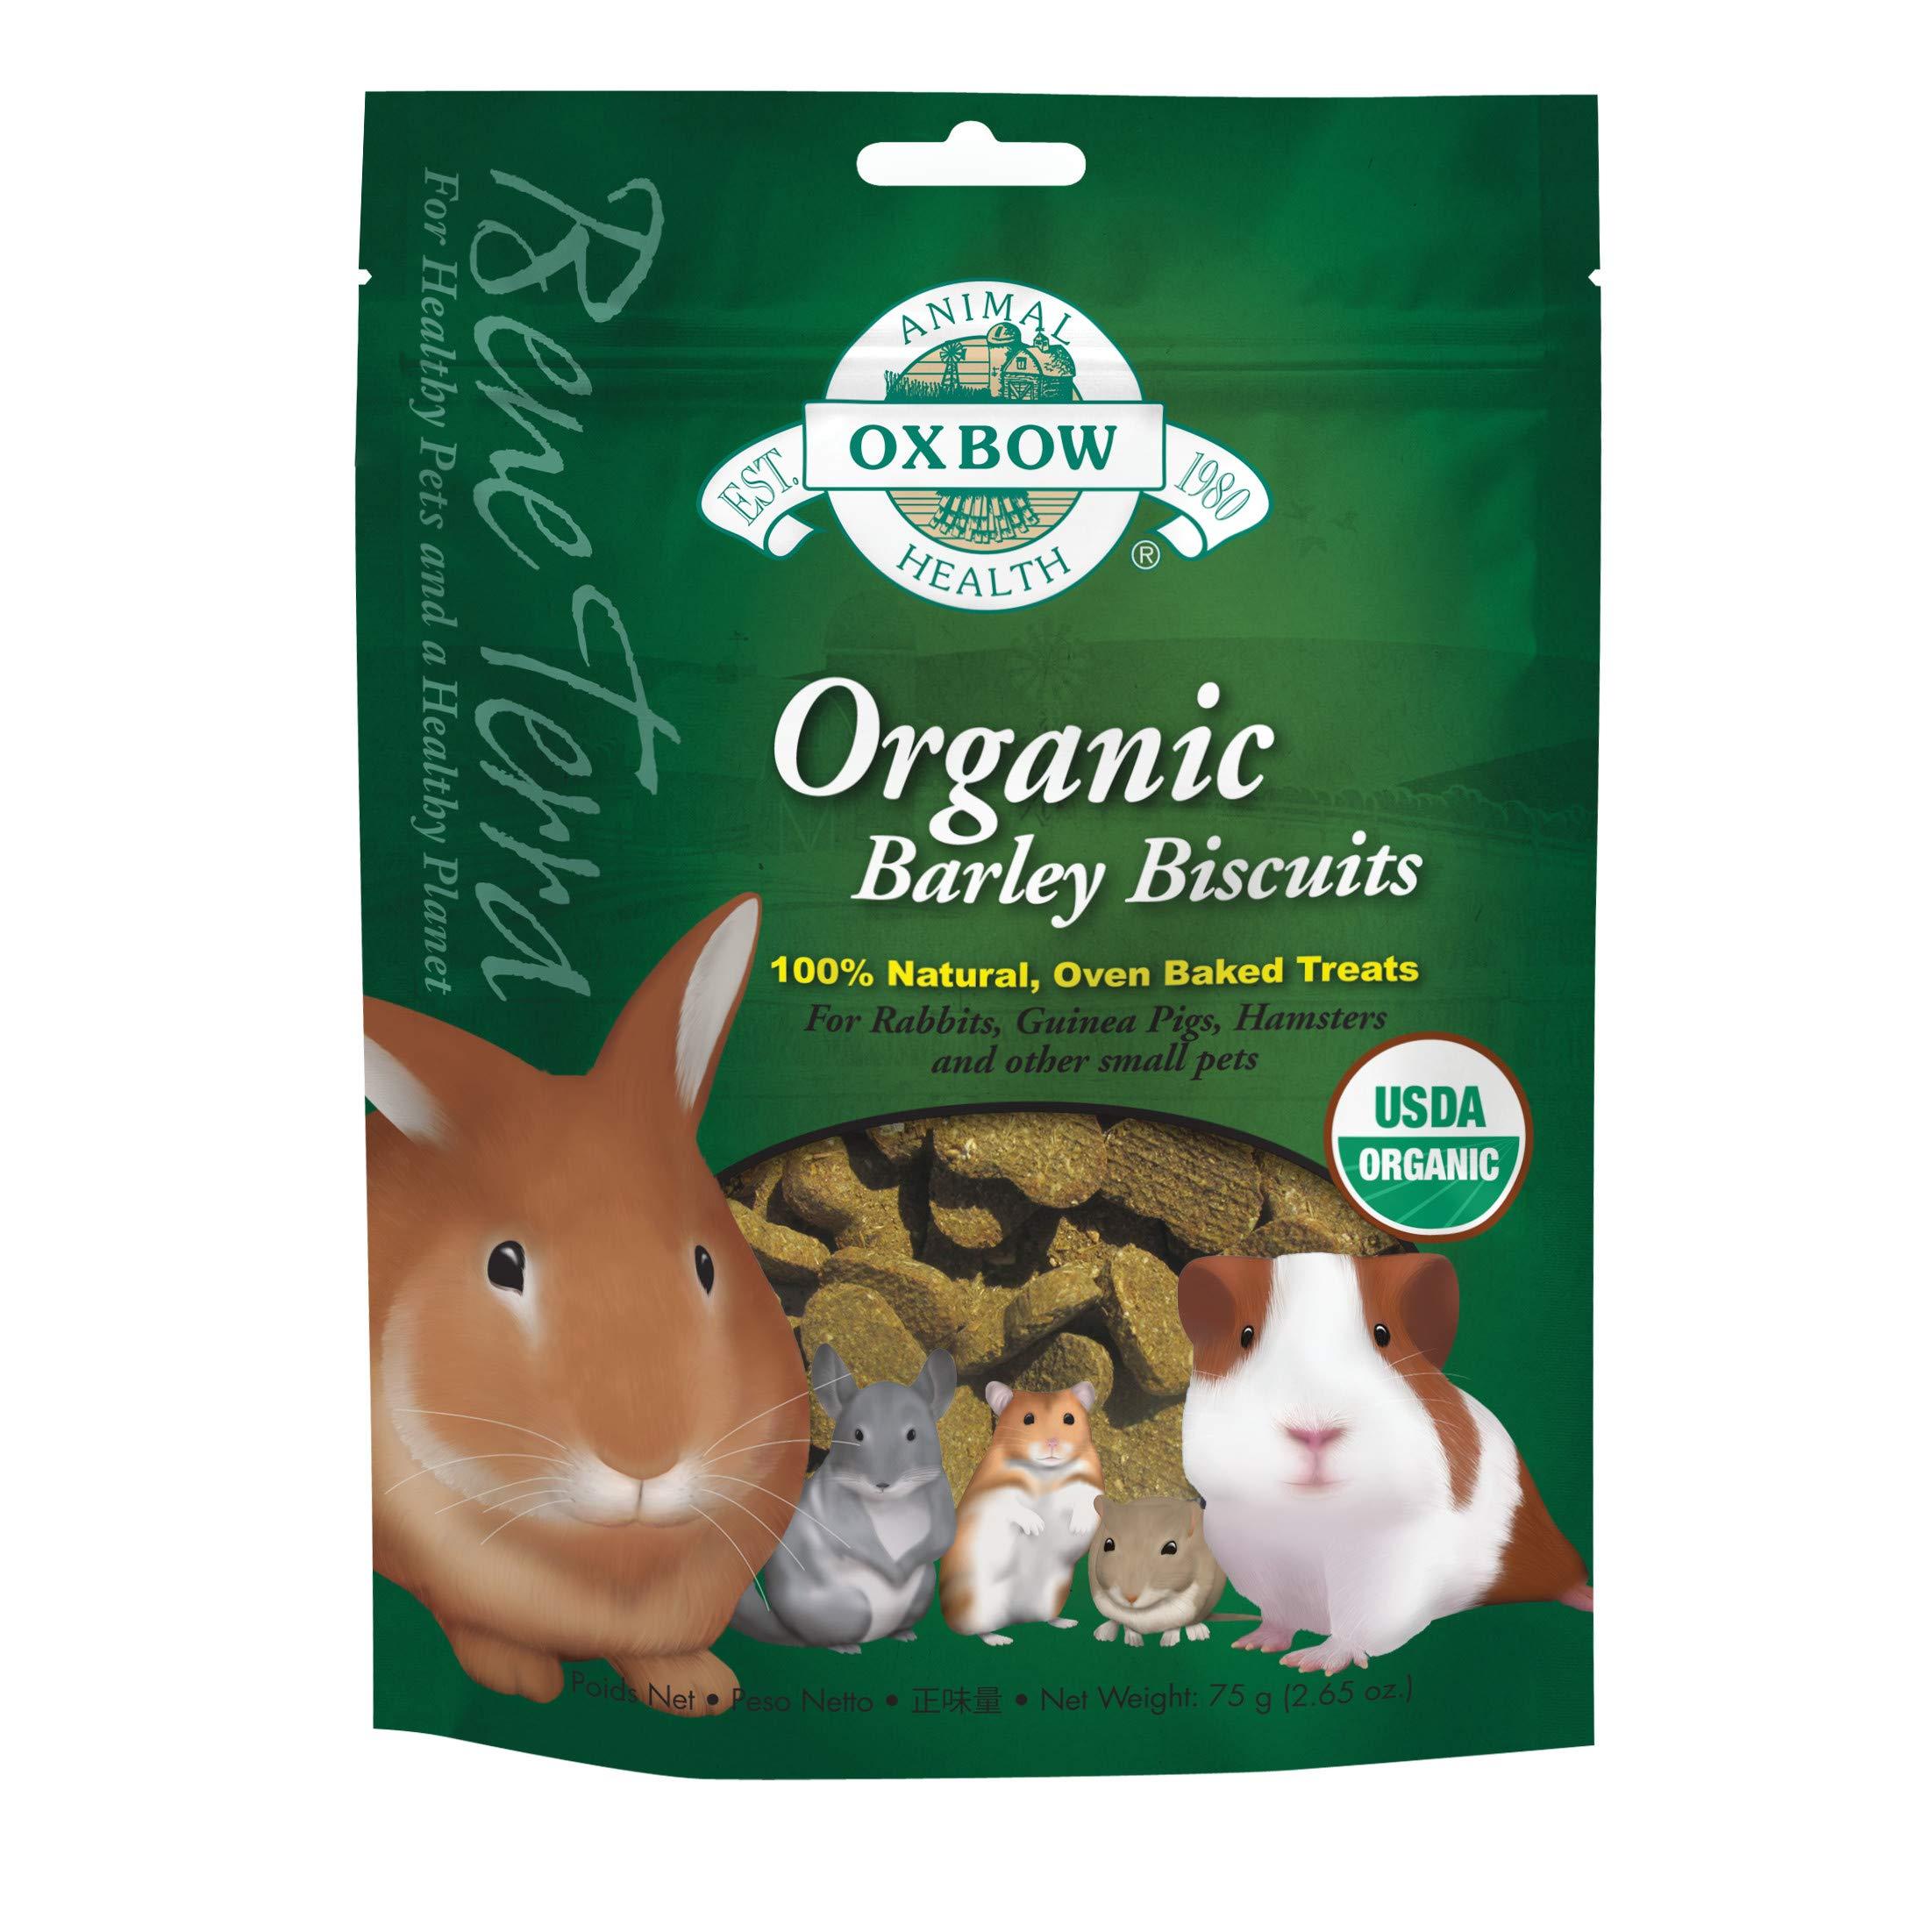 Oxbow Animal Health Barley Biscuits Bene Terra Organic Food And Treats, 2.65-Ounce, Green